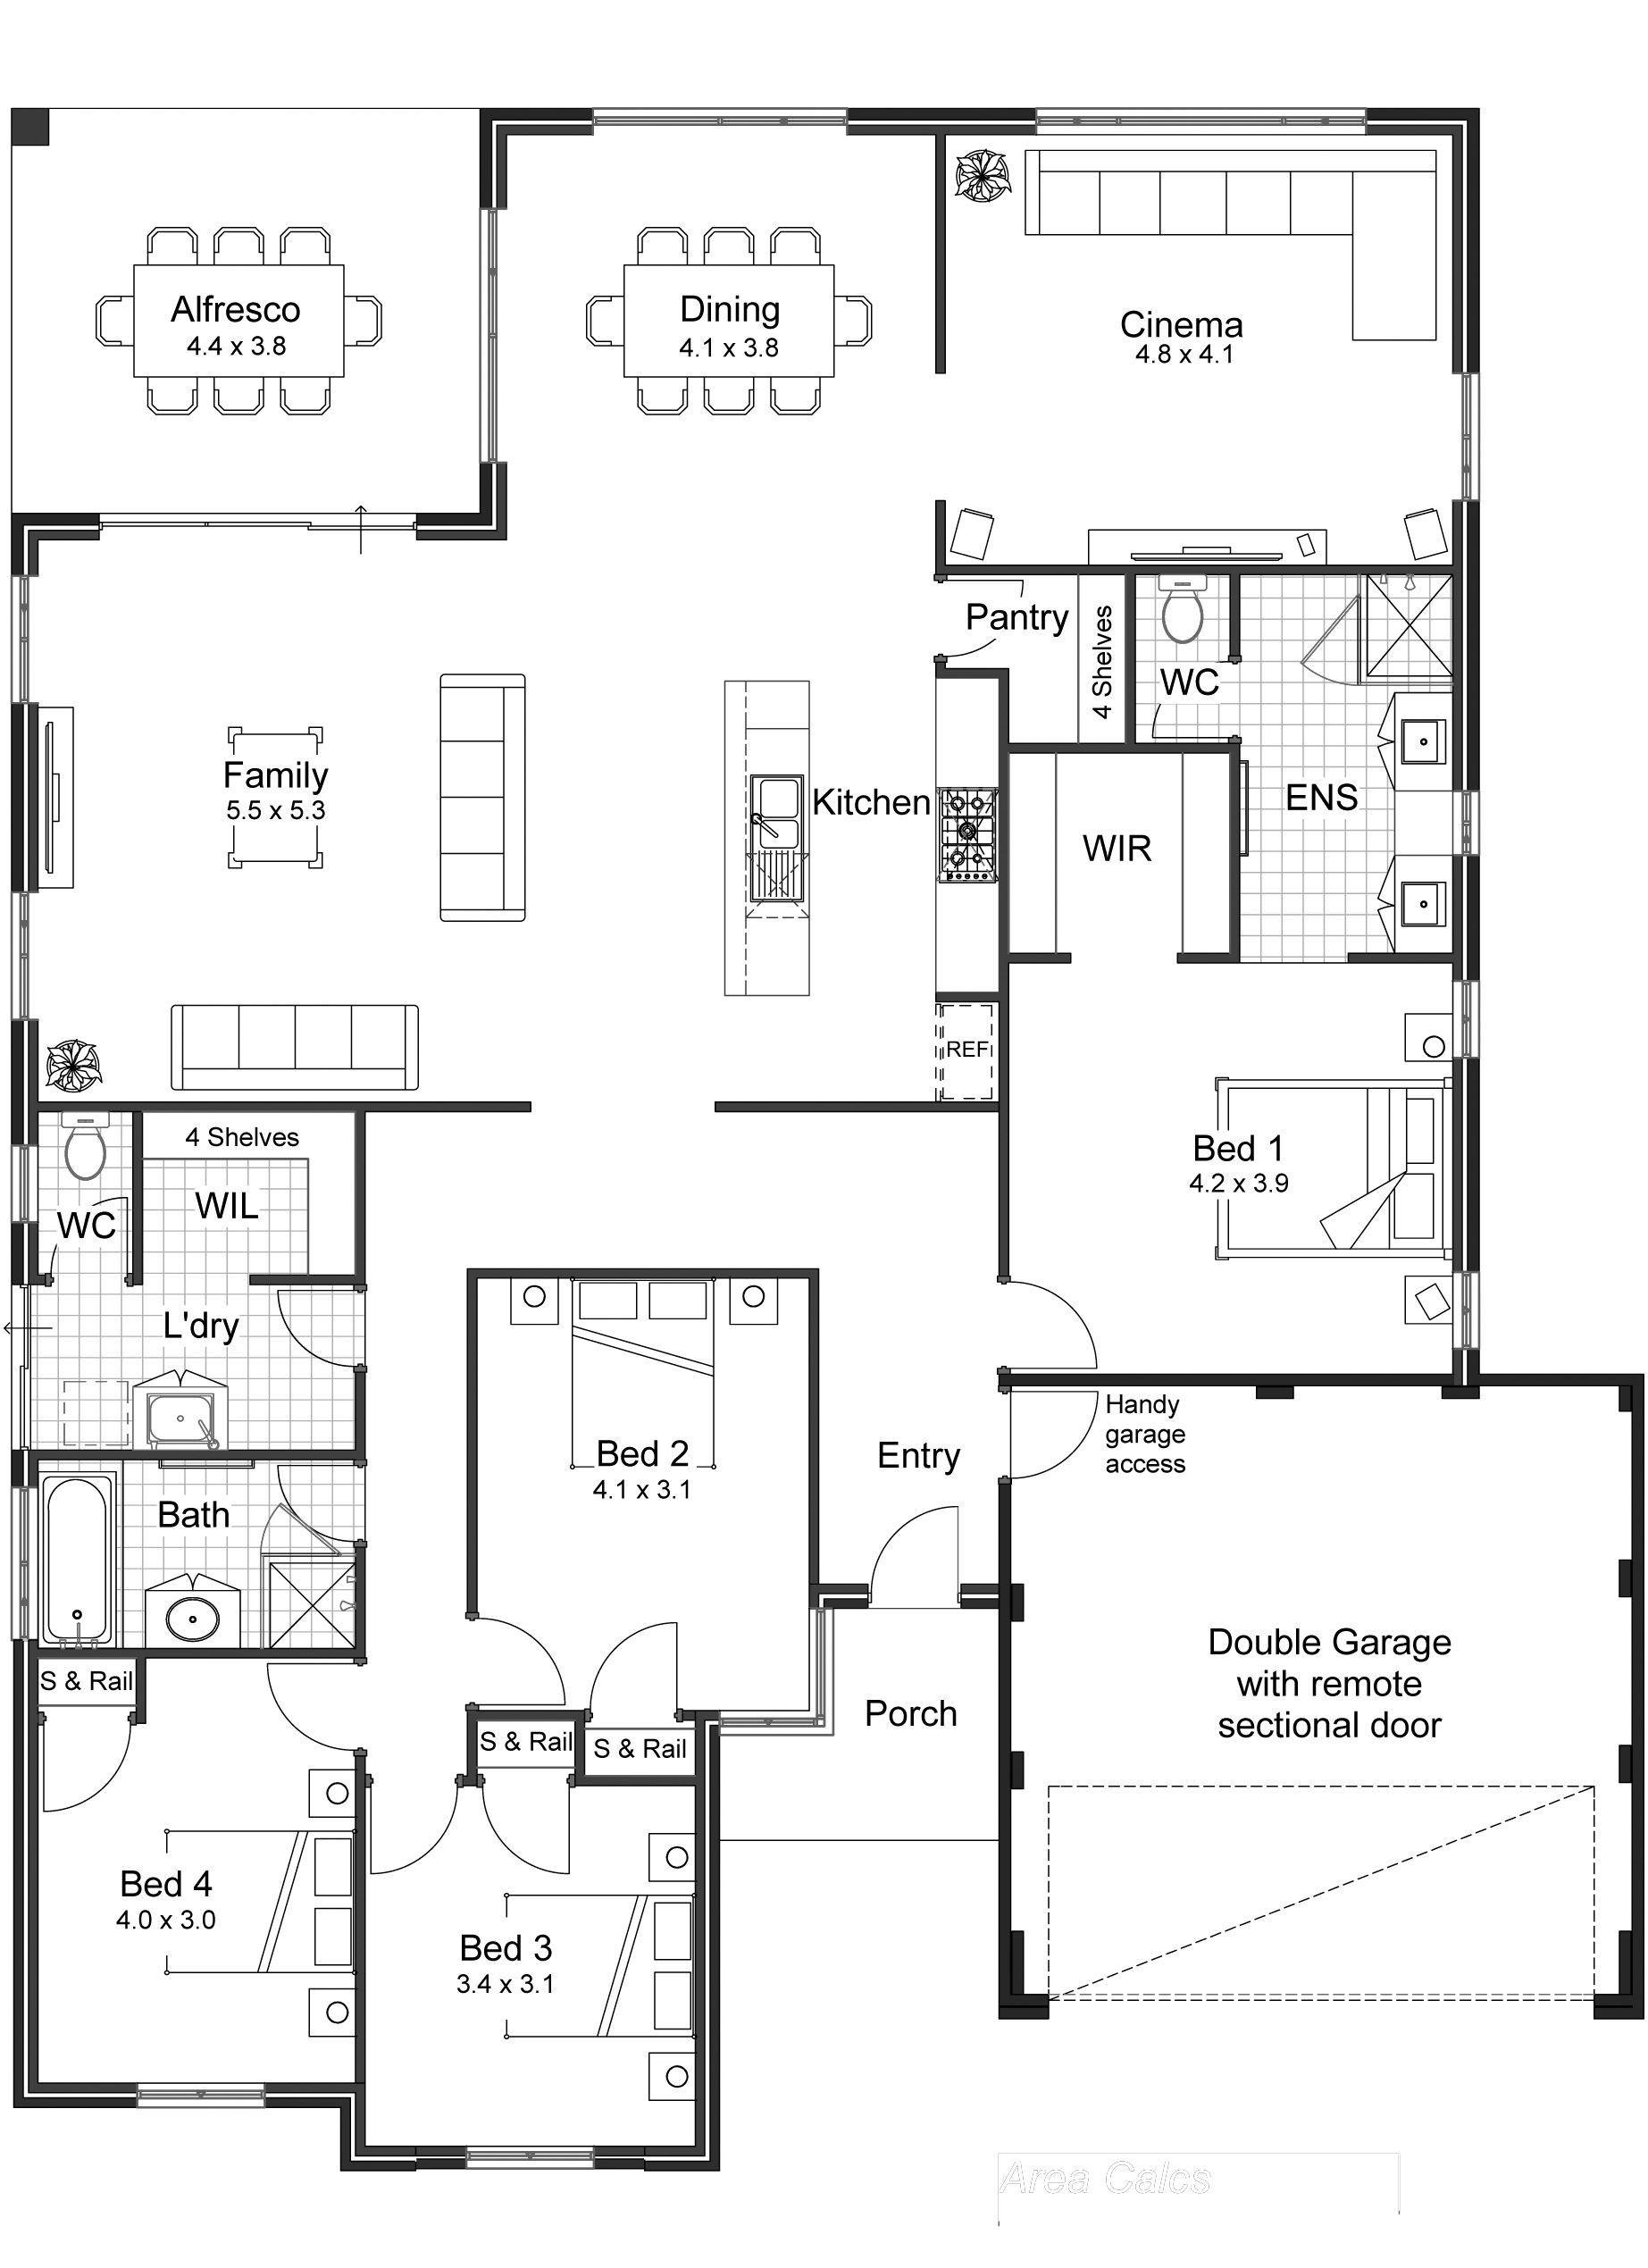 Open Plan House Plans 2020 Open Plan House Plans. Open